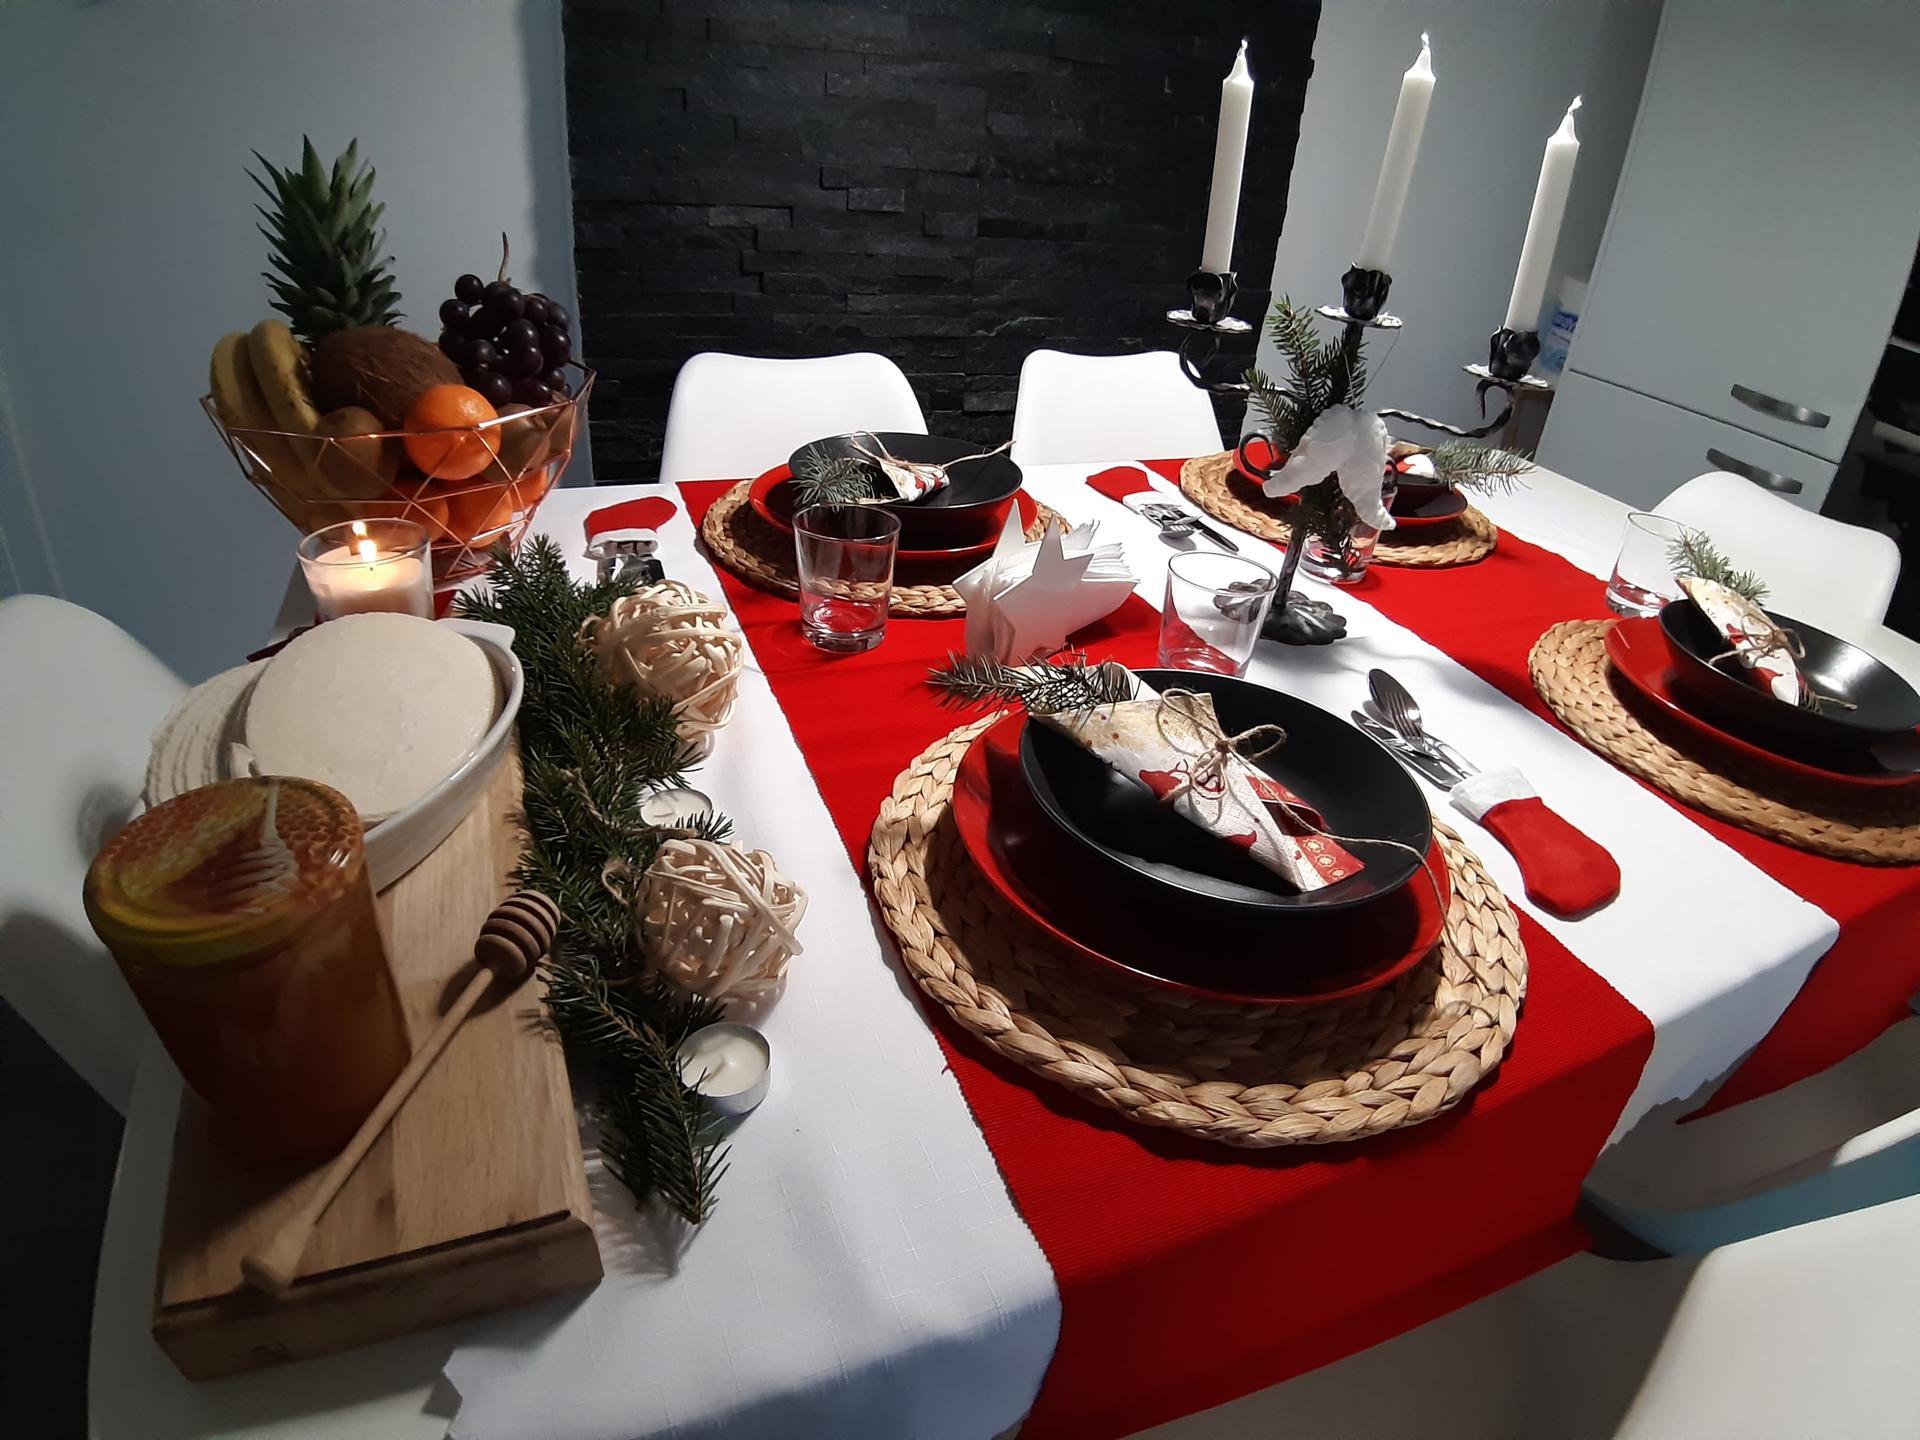 *čriepky od Nás* - Štedrá večera / Vianoce 2019